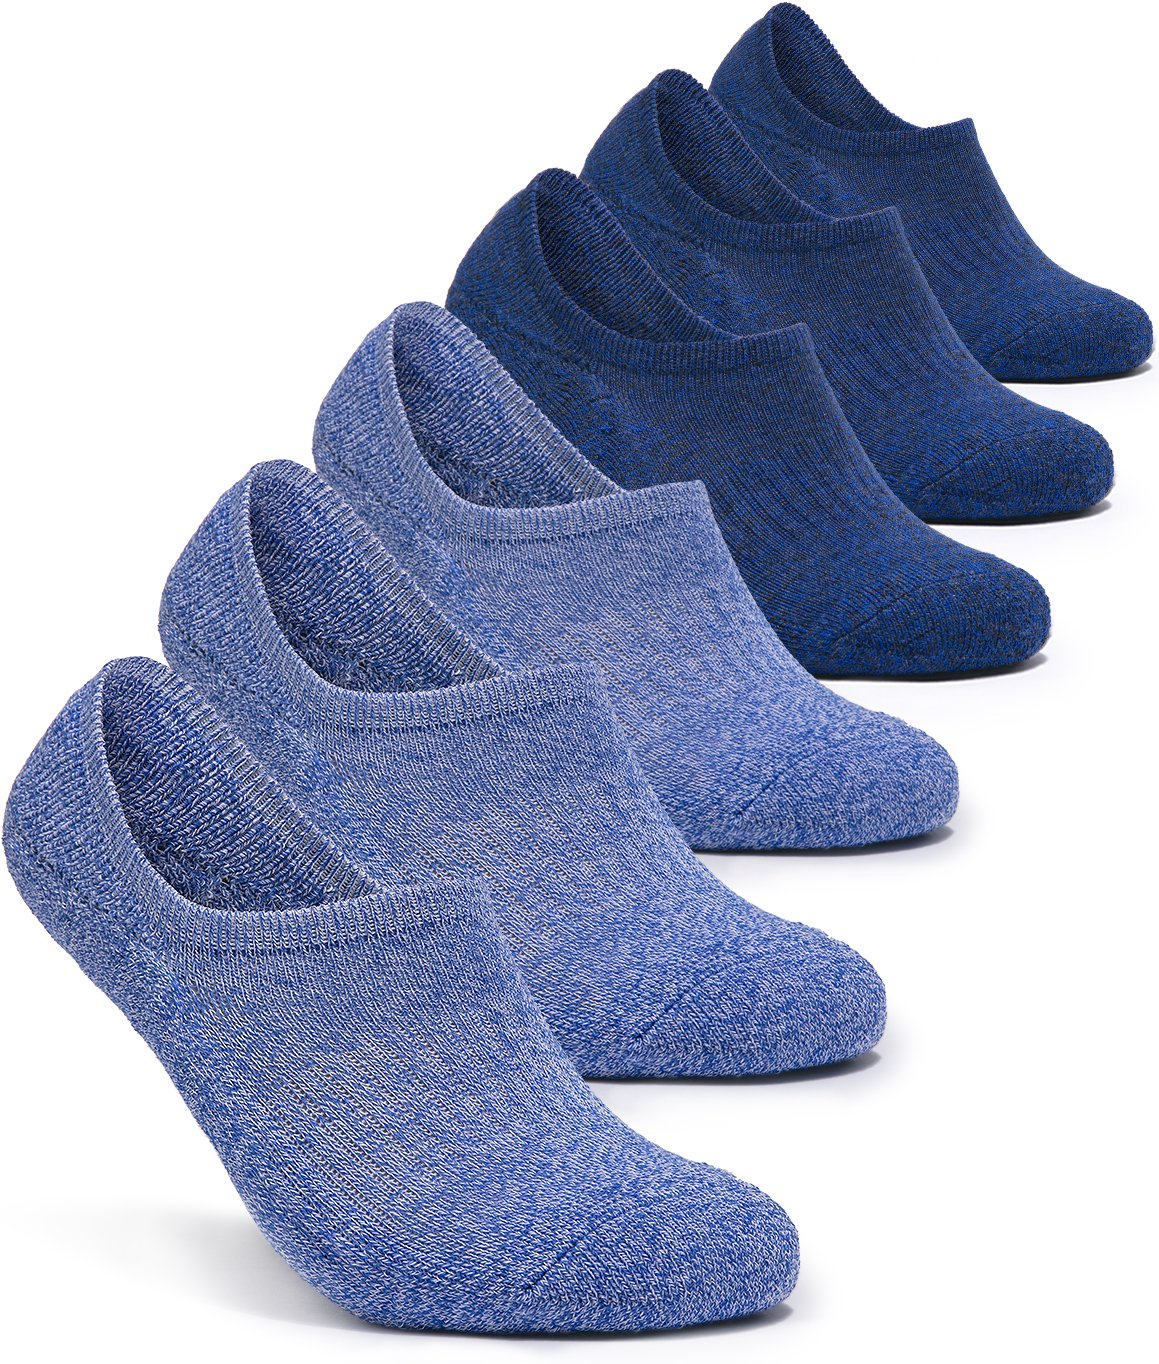 Tesla TM-MZS07-LBB_Medium 6-Pairs Unisex No-Show Casual Fashion Socks w Heel Silicone Grips MZS07